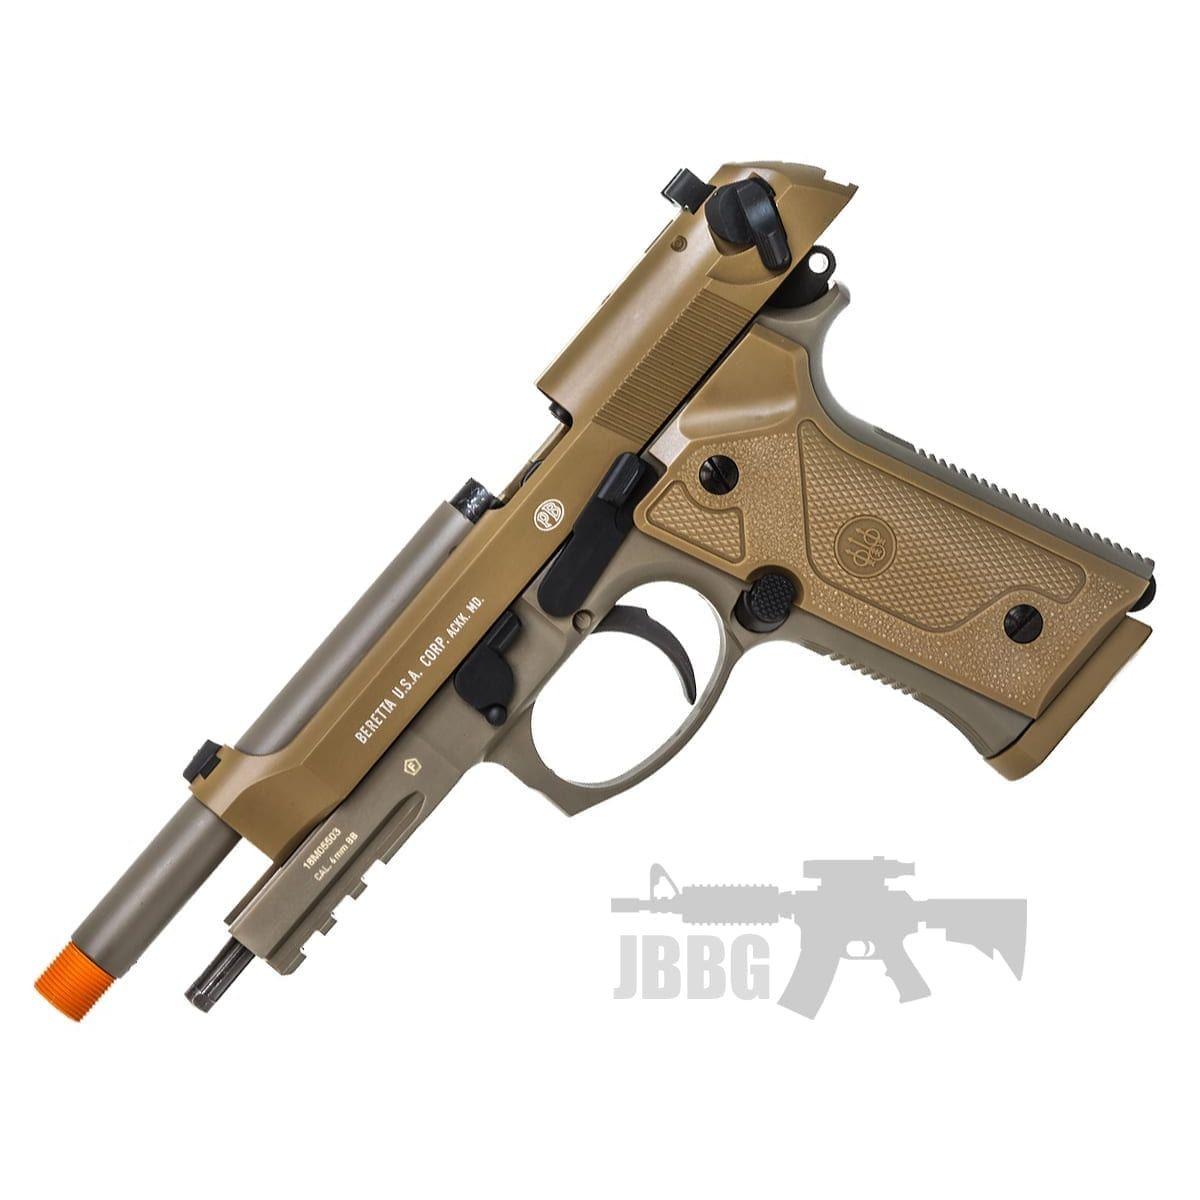 baretta-co2-pistol-gas-tan-gun-good